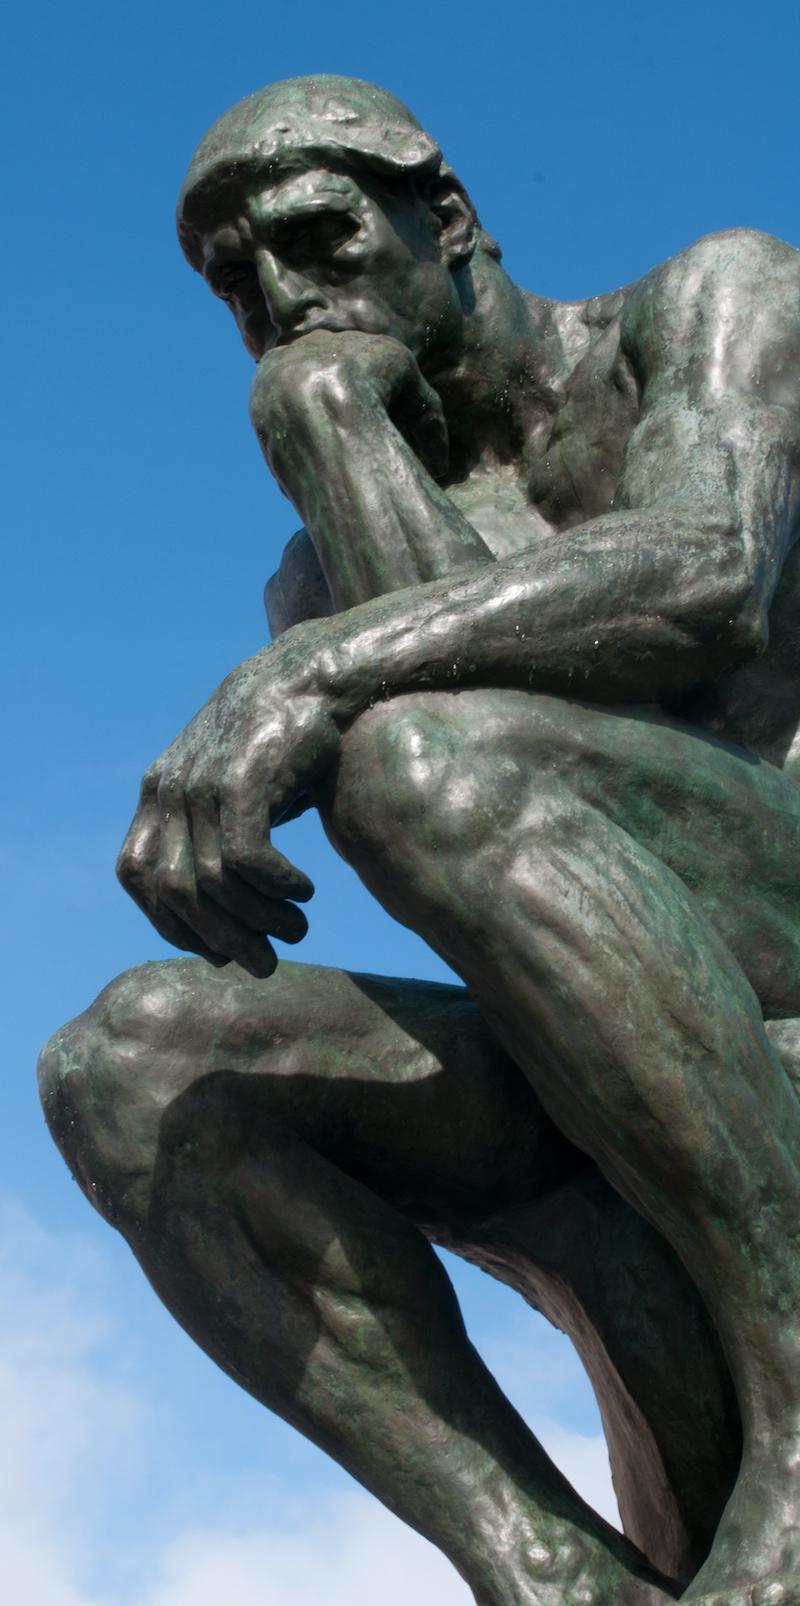 Pensamiento crítico por Alberto Astorga